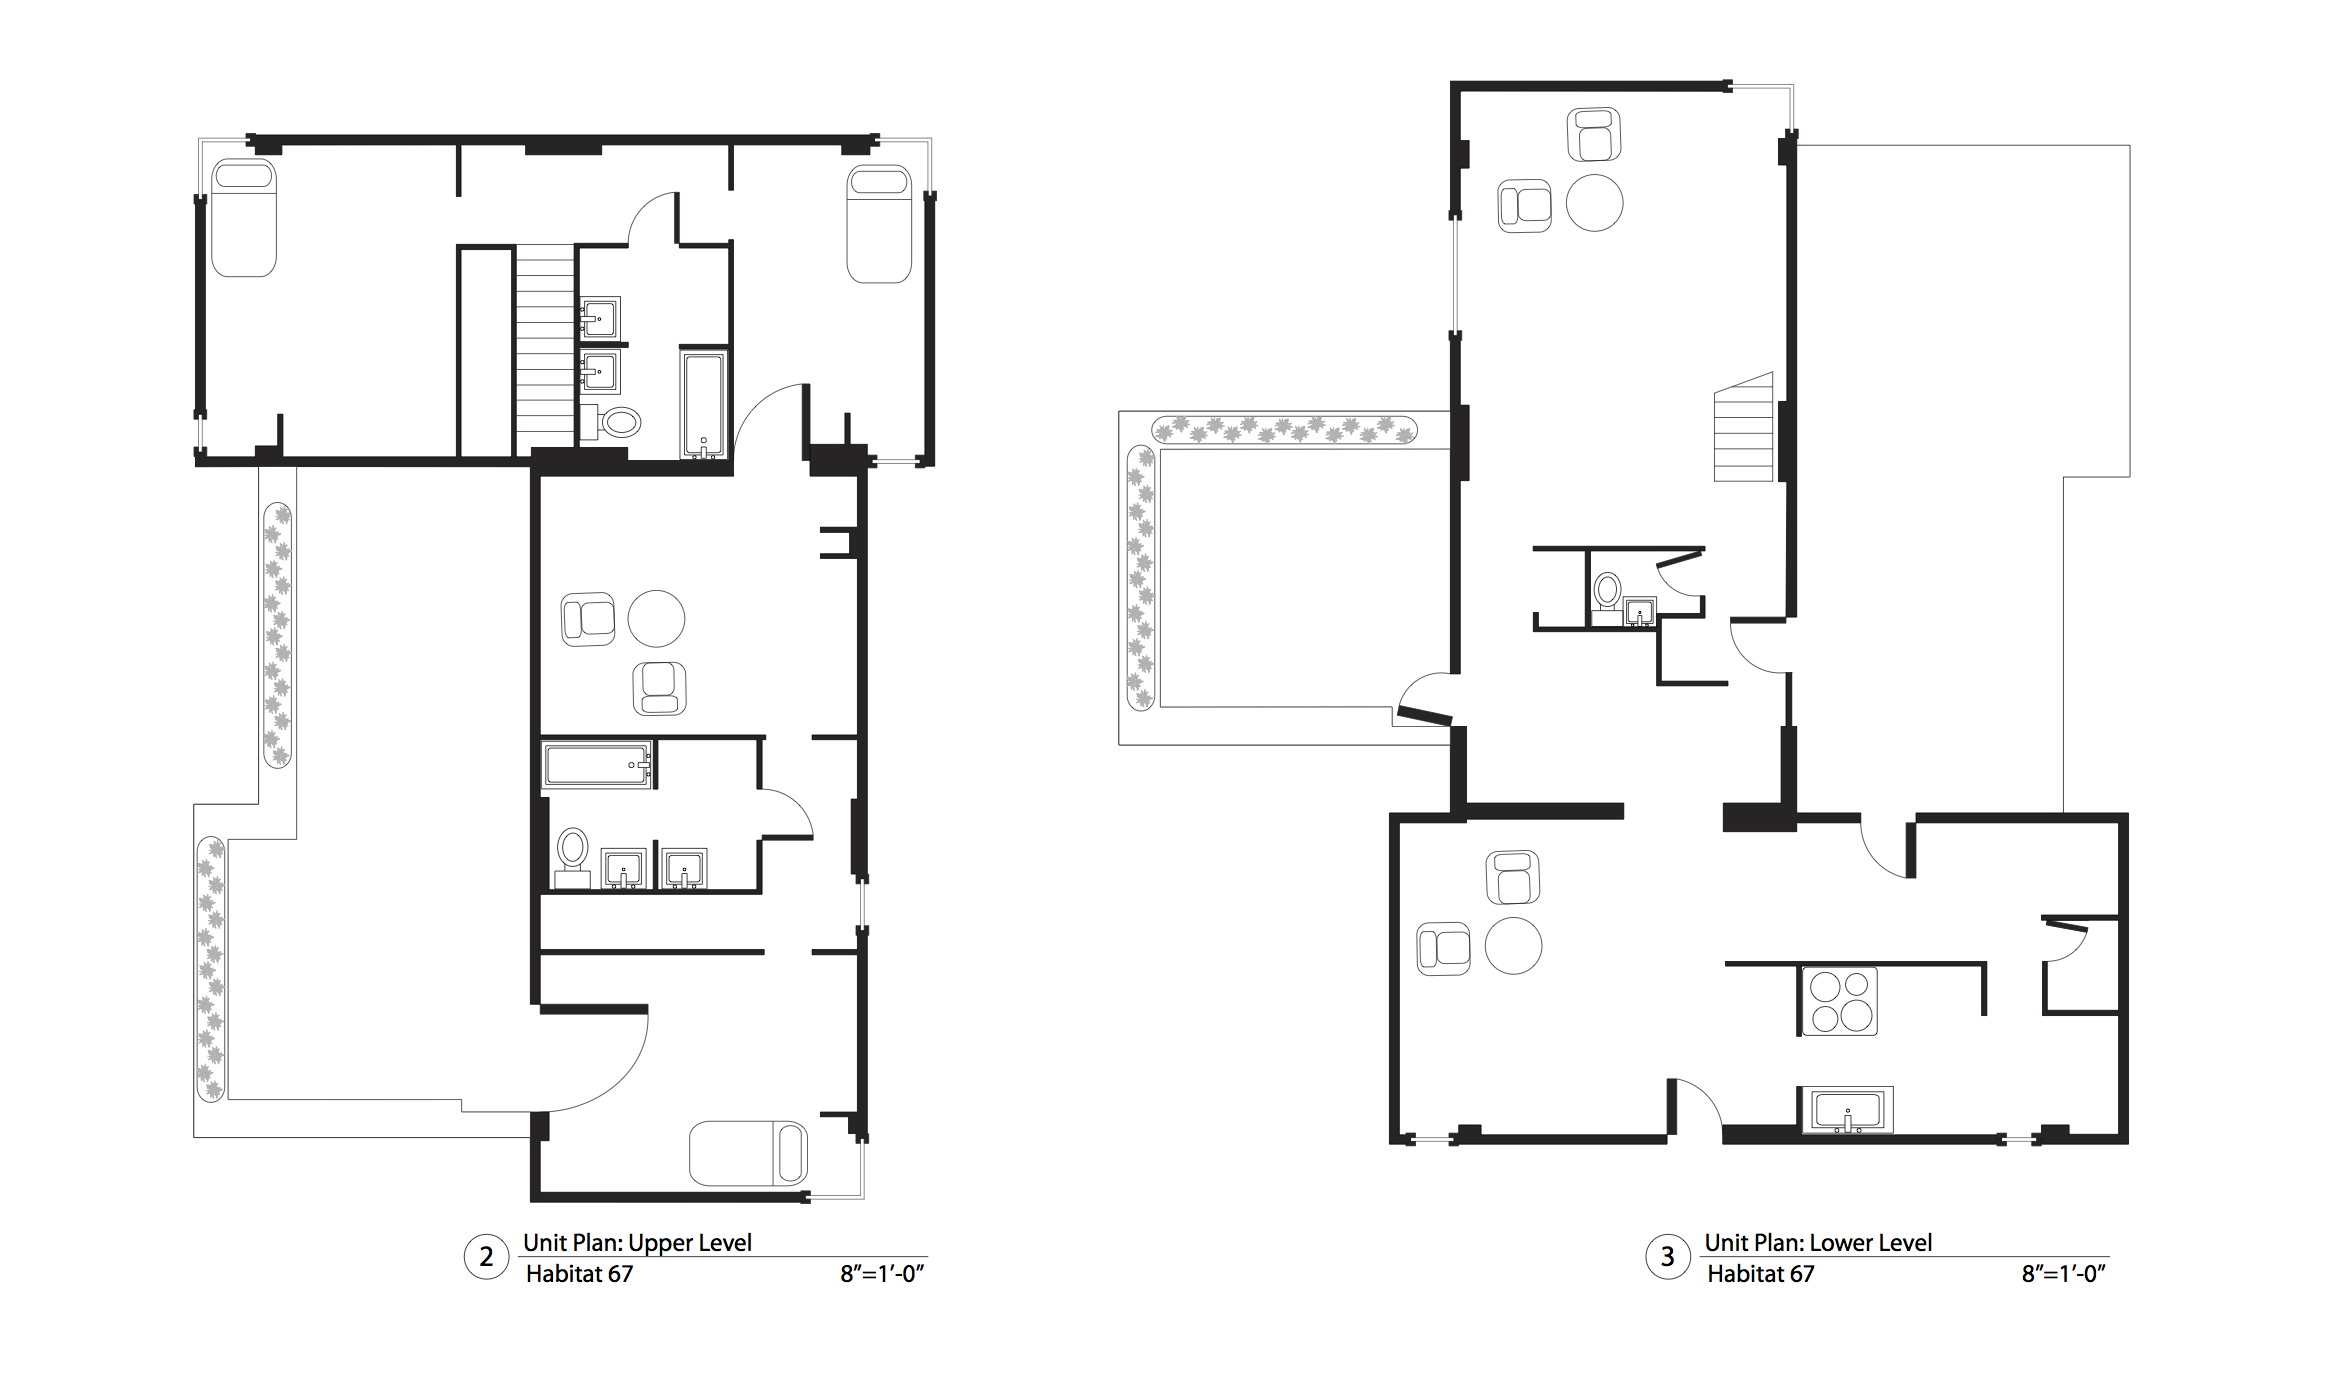 Habitat 67 Floor Plans